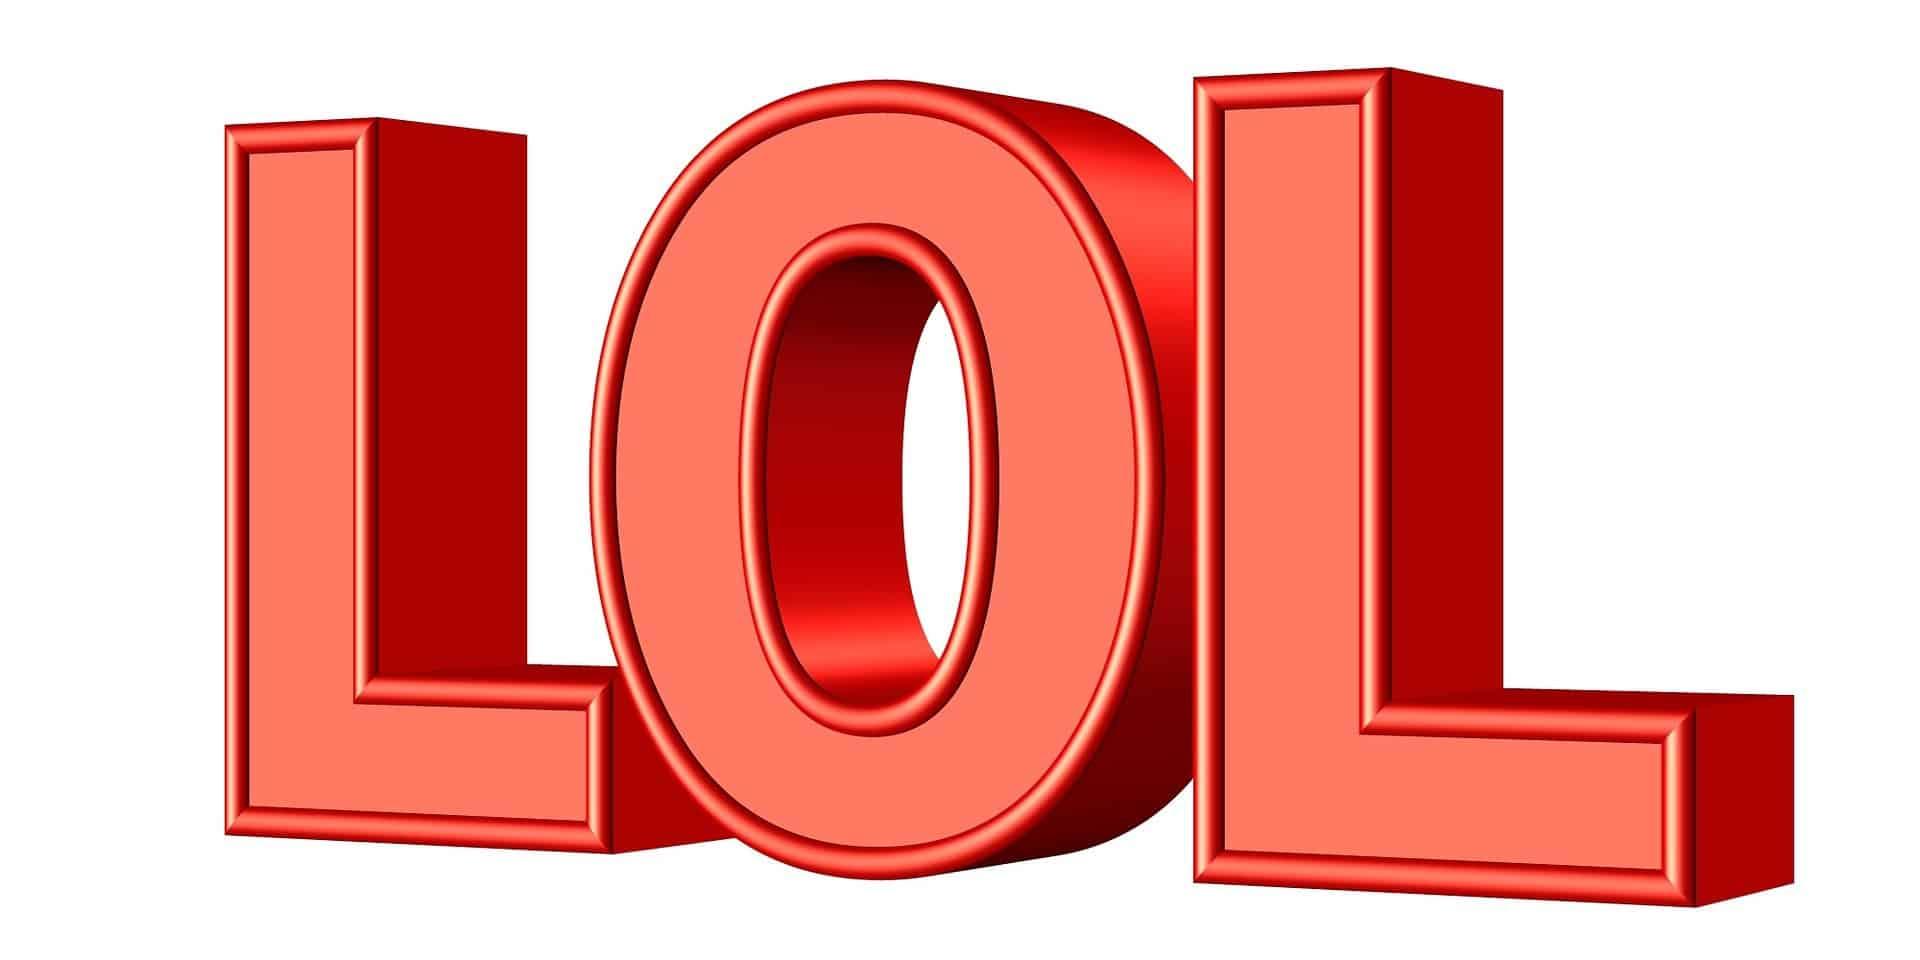 Che cosa significa lol cosa vuol dire imho, rotfl, lmao, afk, omg, troll, nerd, geek e altre